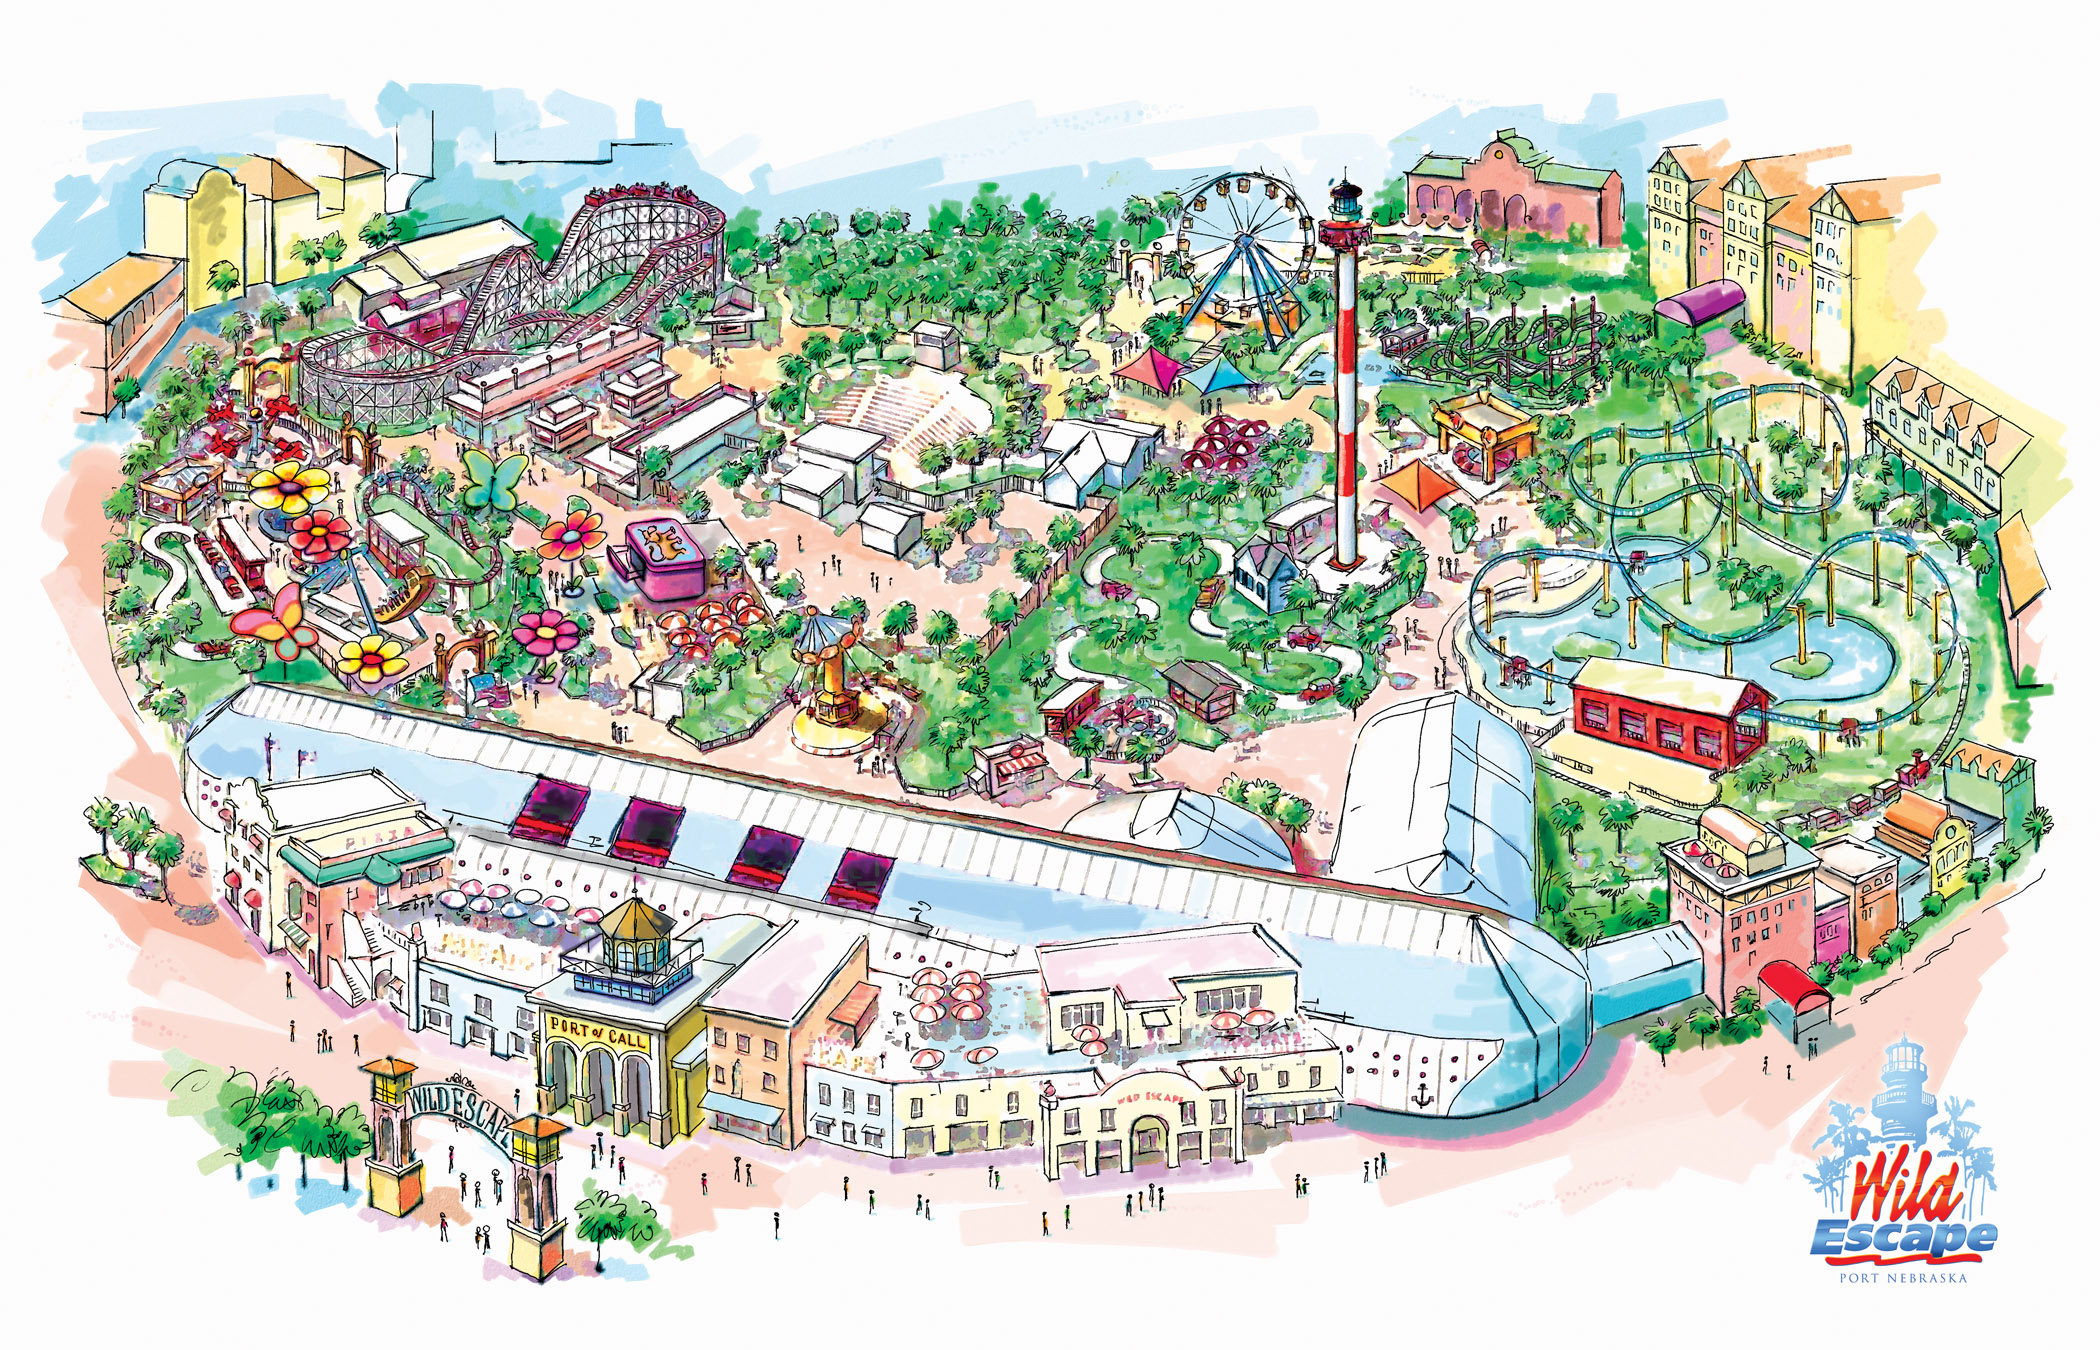 2100x1350 Omaha Area Amusement Park